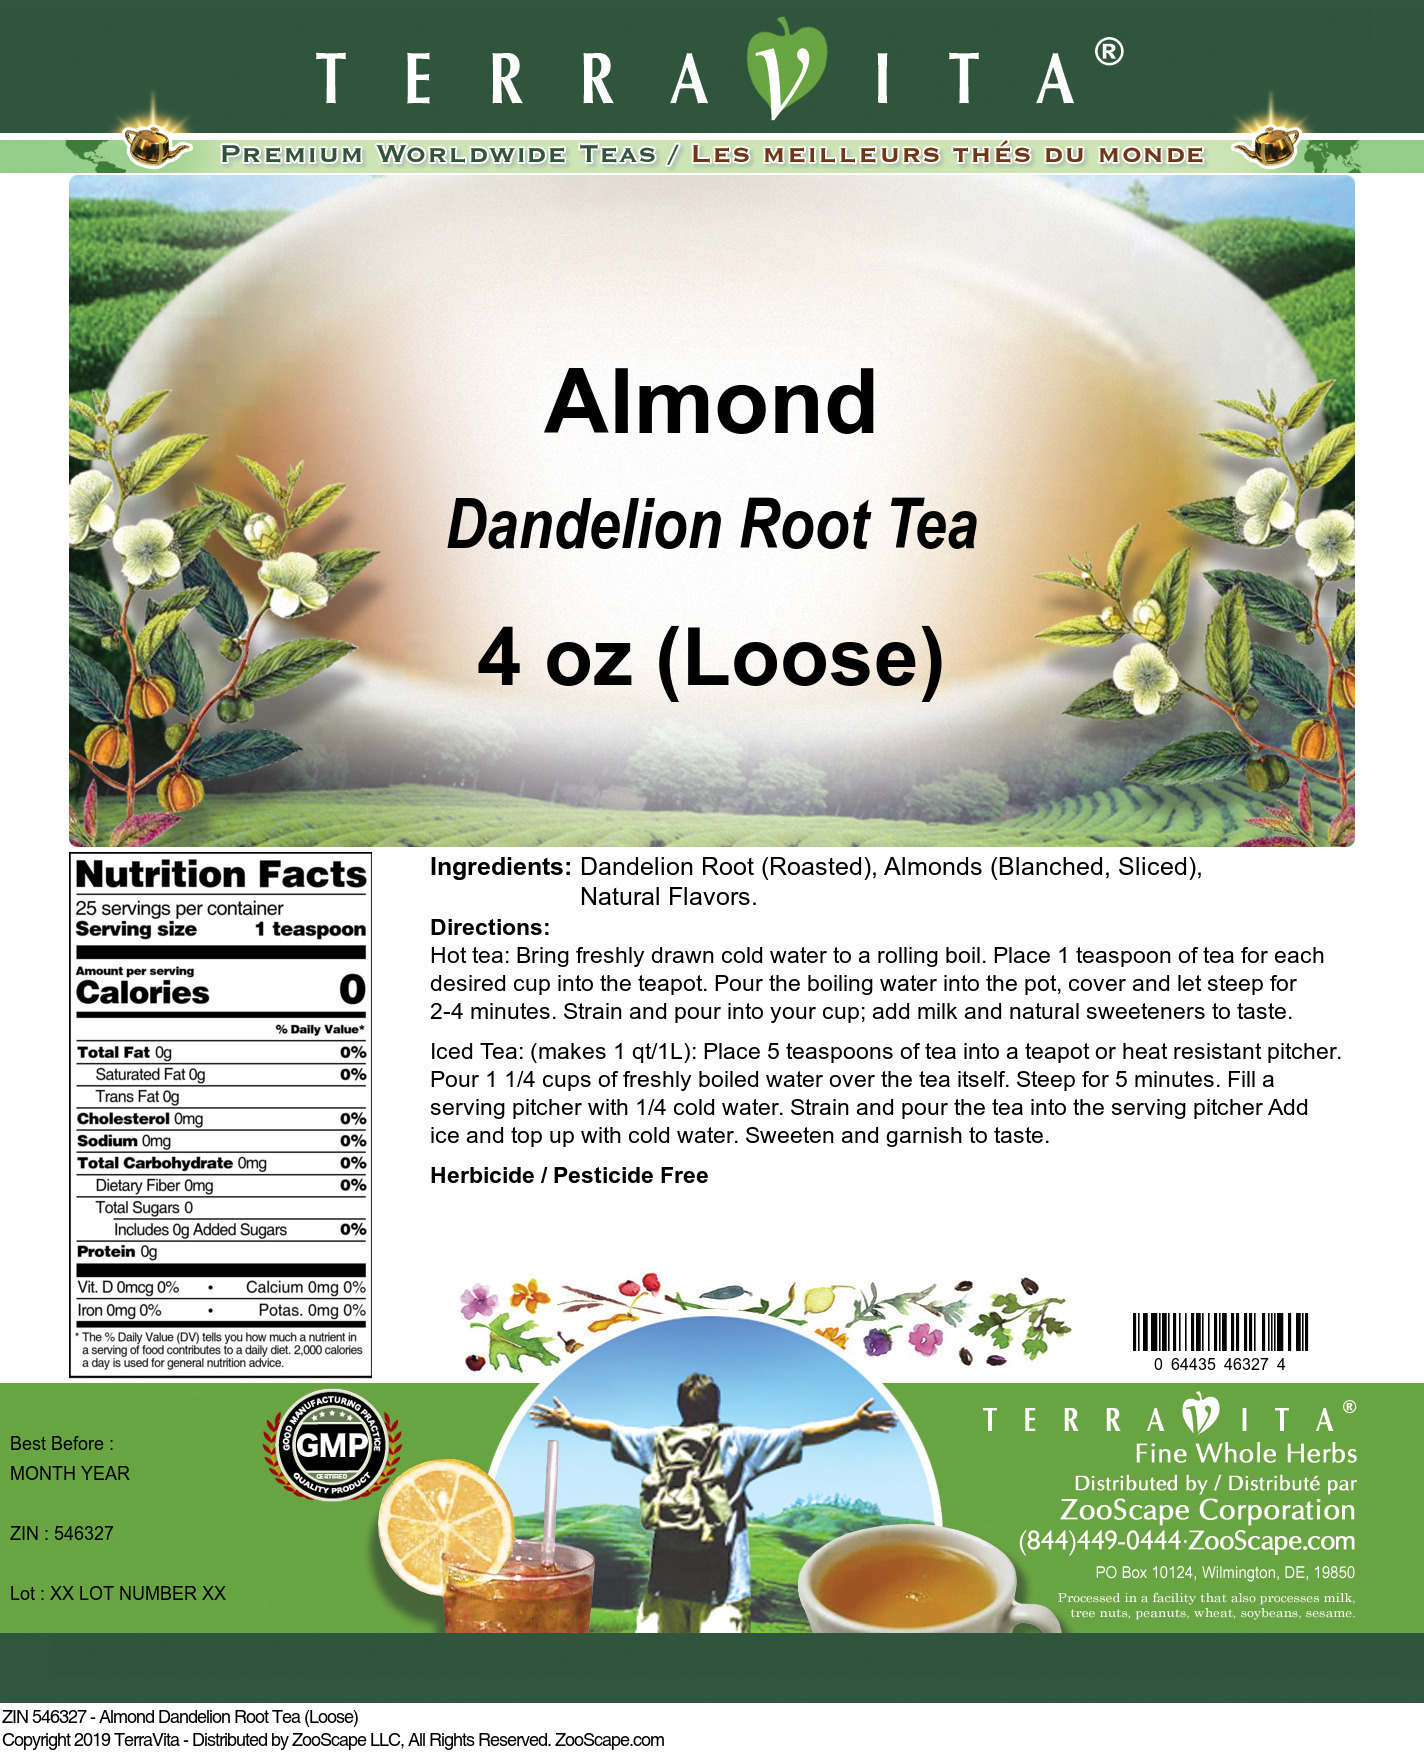 Almond Dandelion Root Tea (Loose)